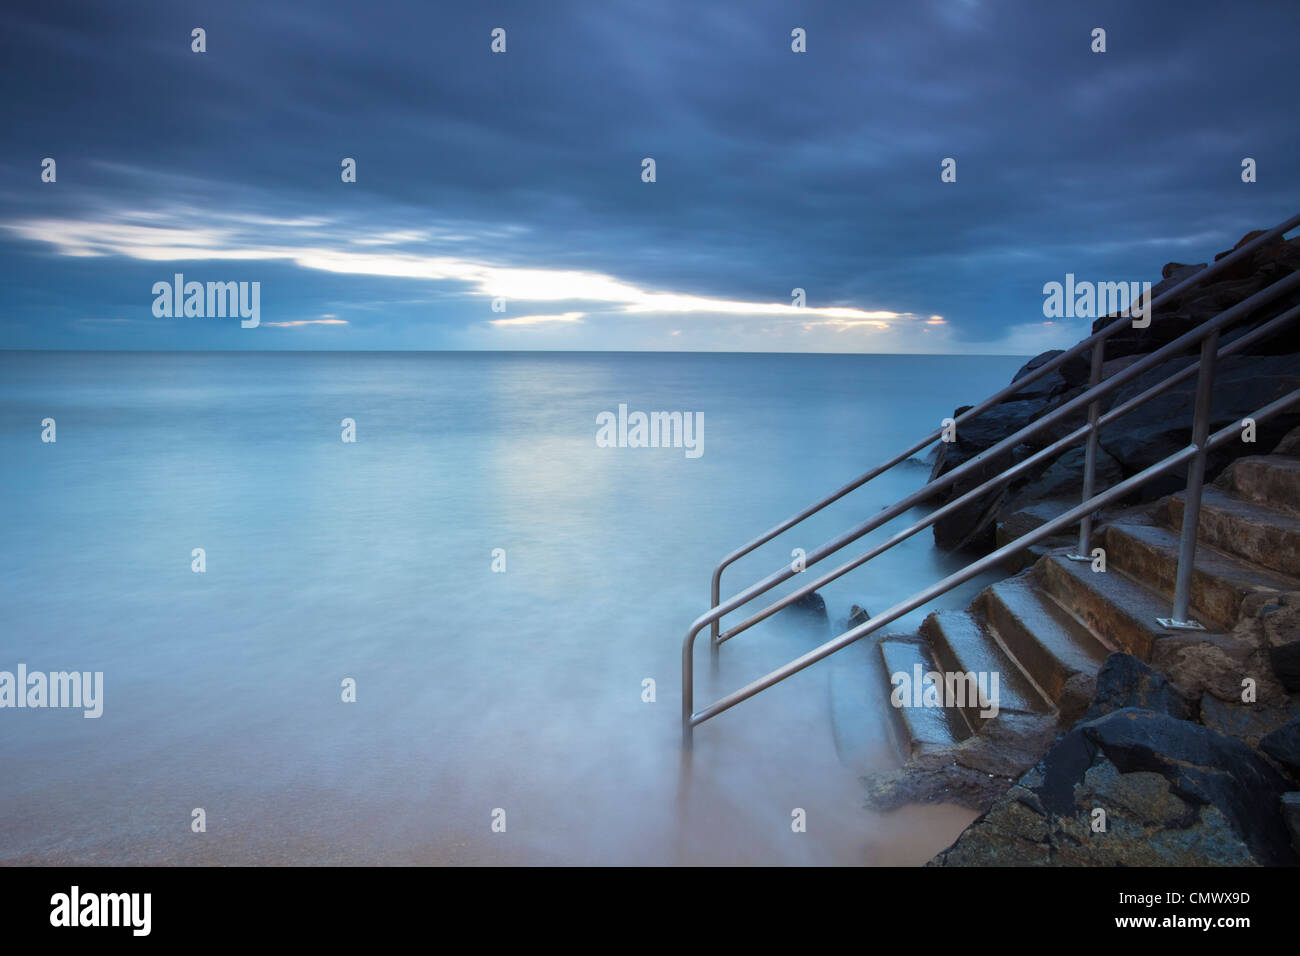 Wellen Waschen über Treppe ins Meer.   Machans Beach, Cairns, Queensland, Australien Stockfoto